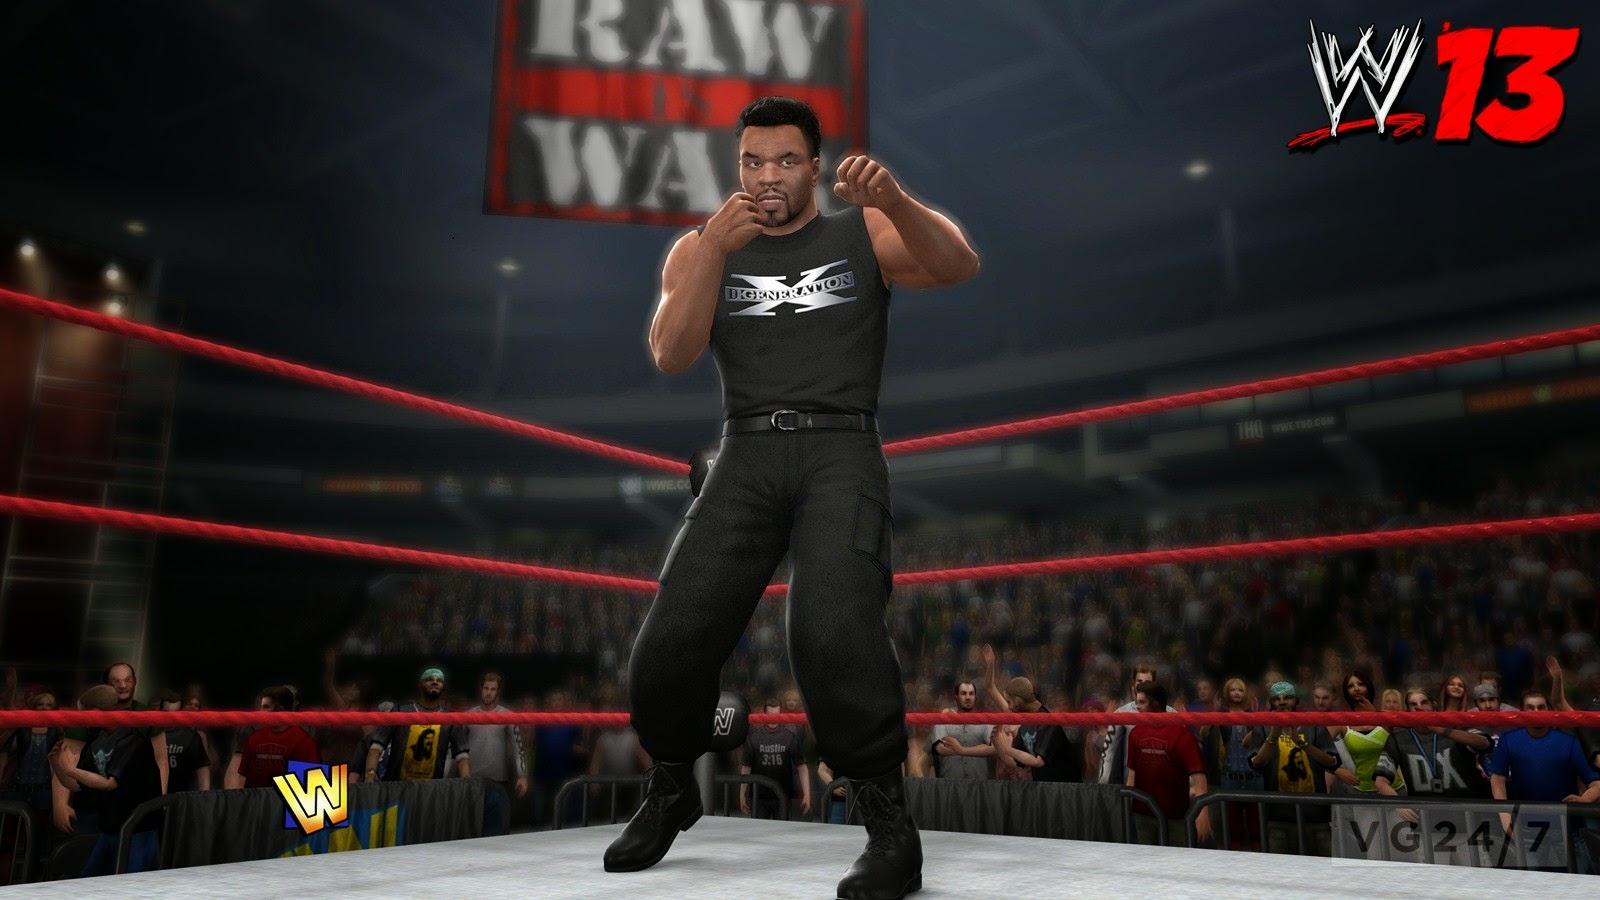 WWE unique installment W13 Free Download ISO